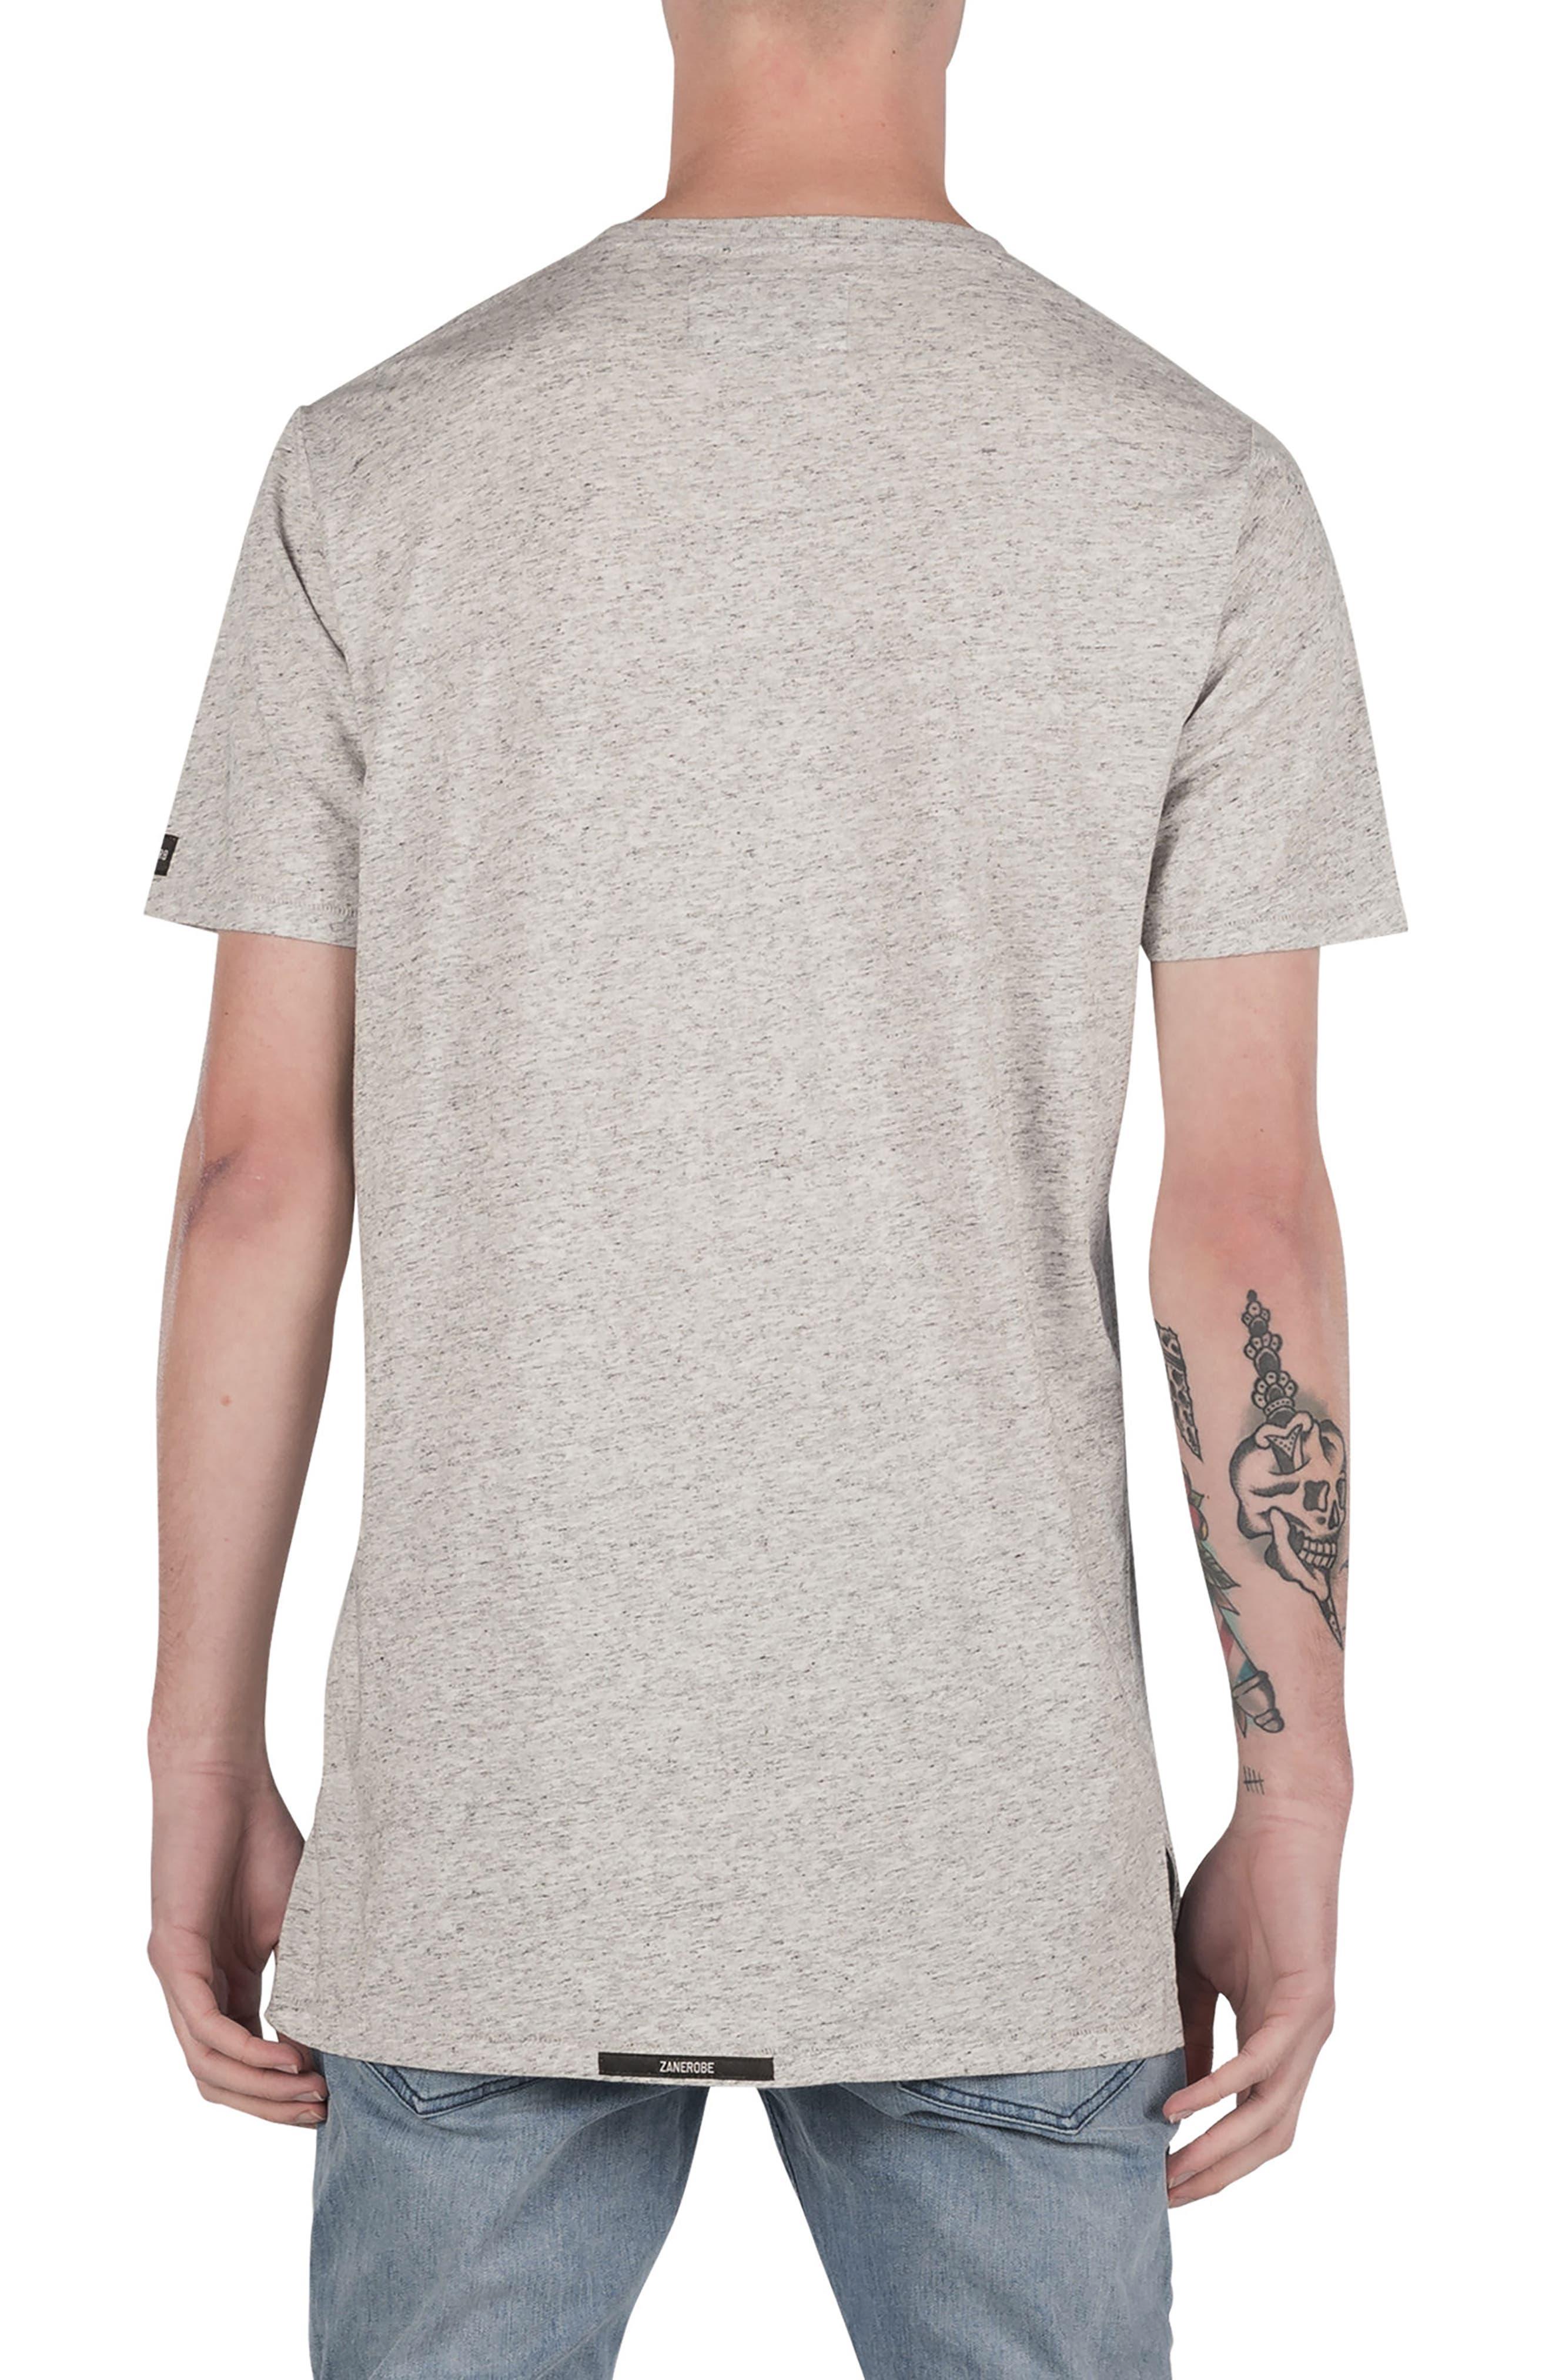 Flintlock T-Shirt,                             Alternate thumbnail 2, color,                             060